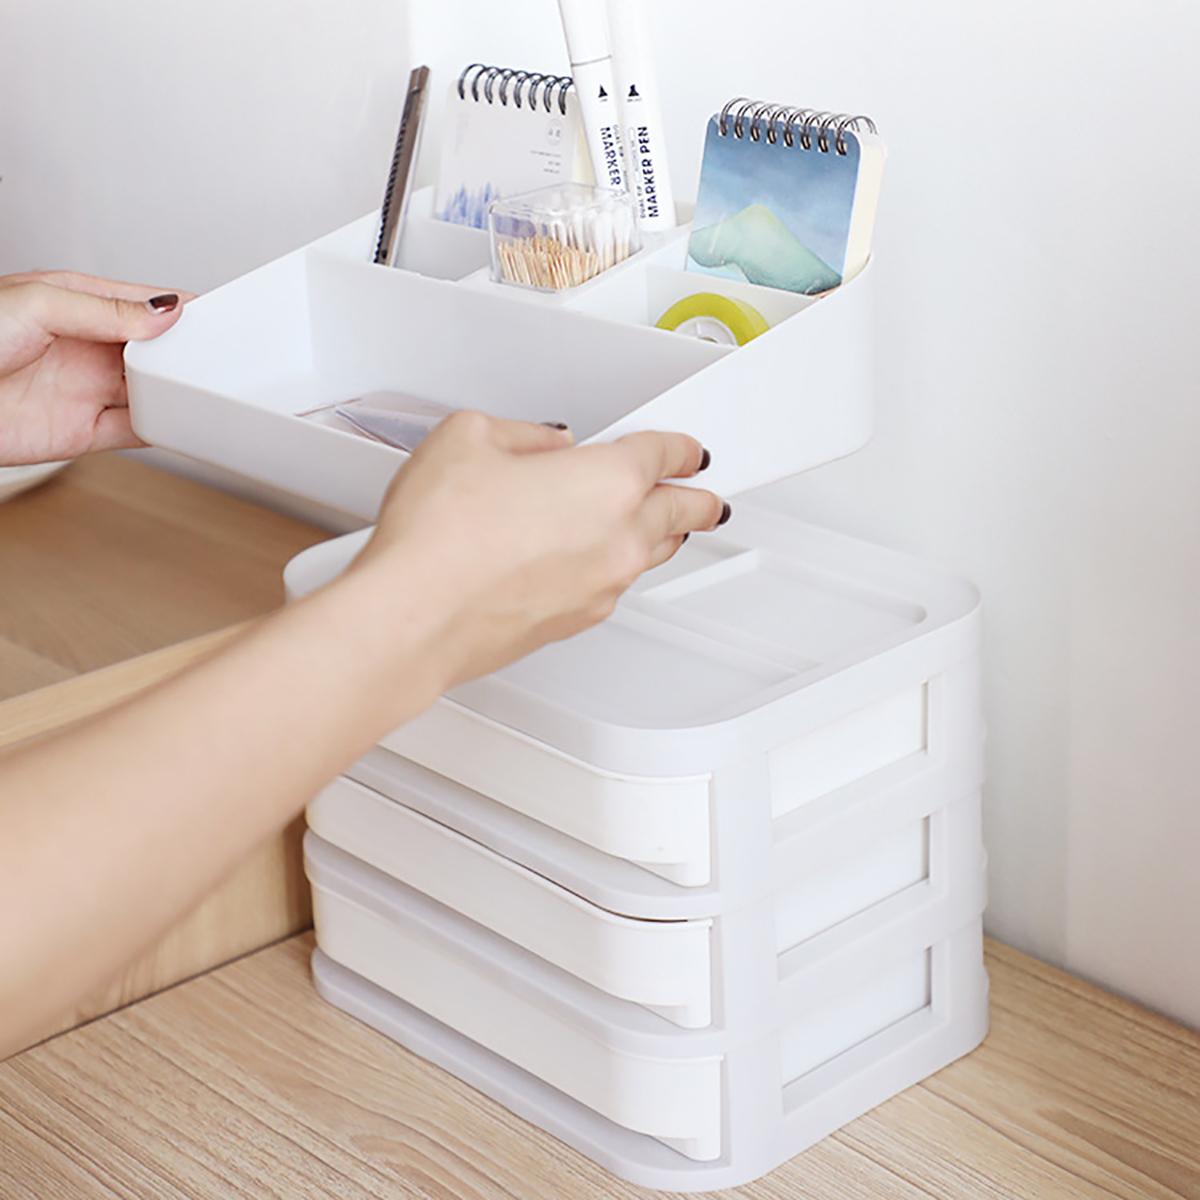 Desktop Cosmetics Storage Box Plastic Makeup Organizer Drawer Type Sundries Case 1/2/3/4/5 Layers Nail Polish Lipstick Jewelry Case